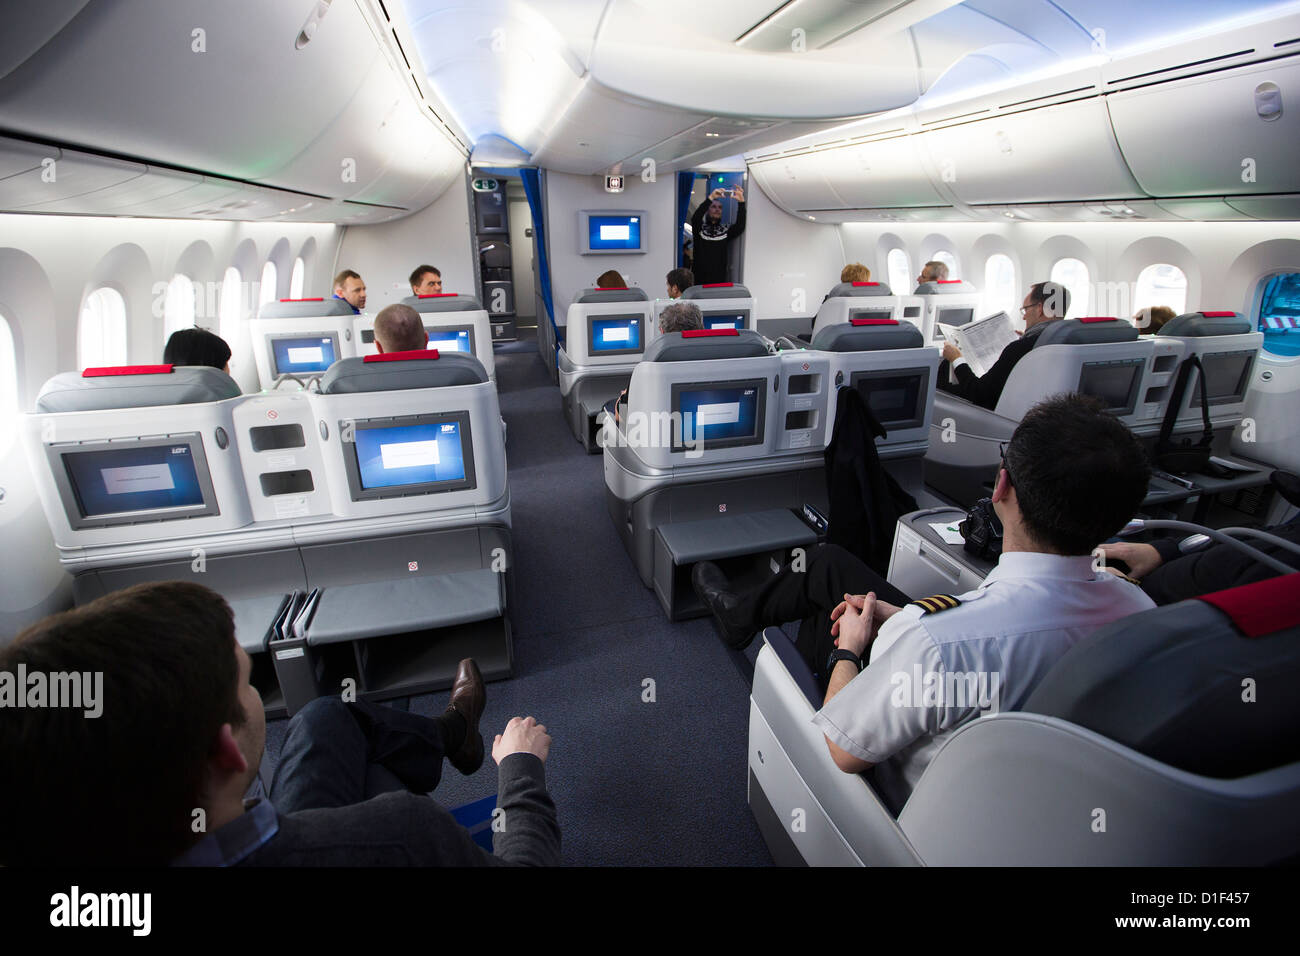 https://c8.alamy.com/compde/d1f457/interieur-boeing-787-dreamliner-d1f457.jpg